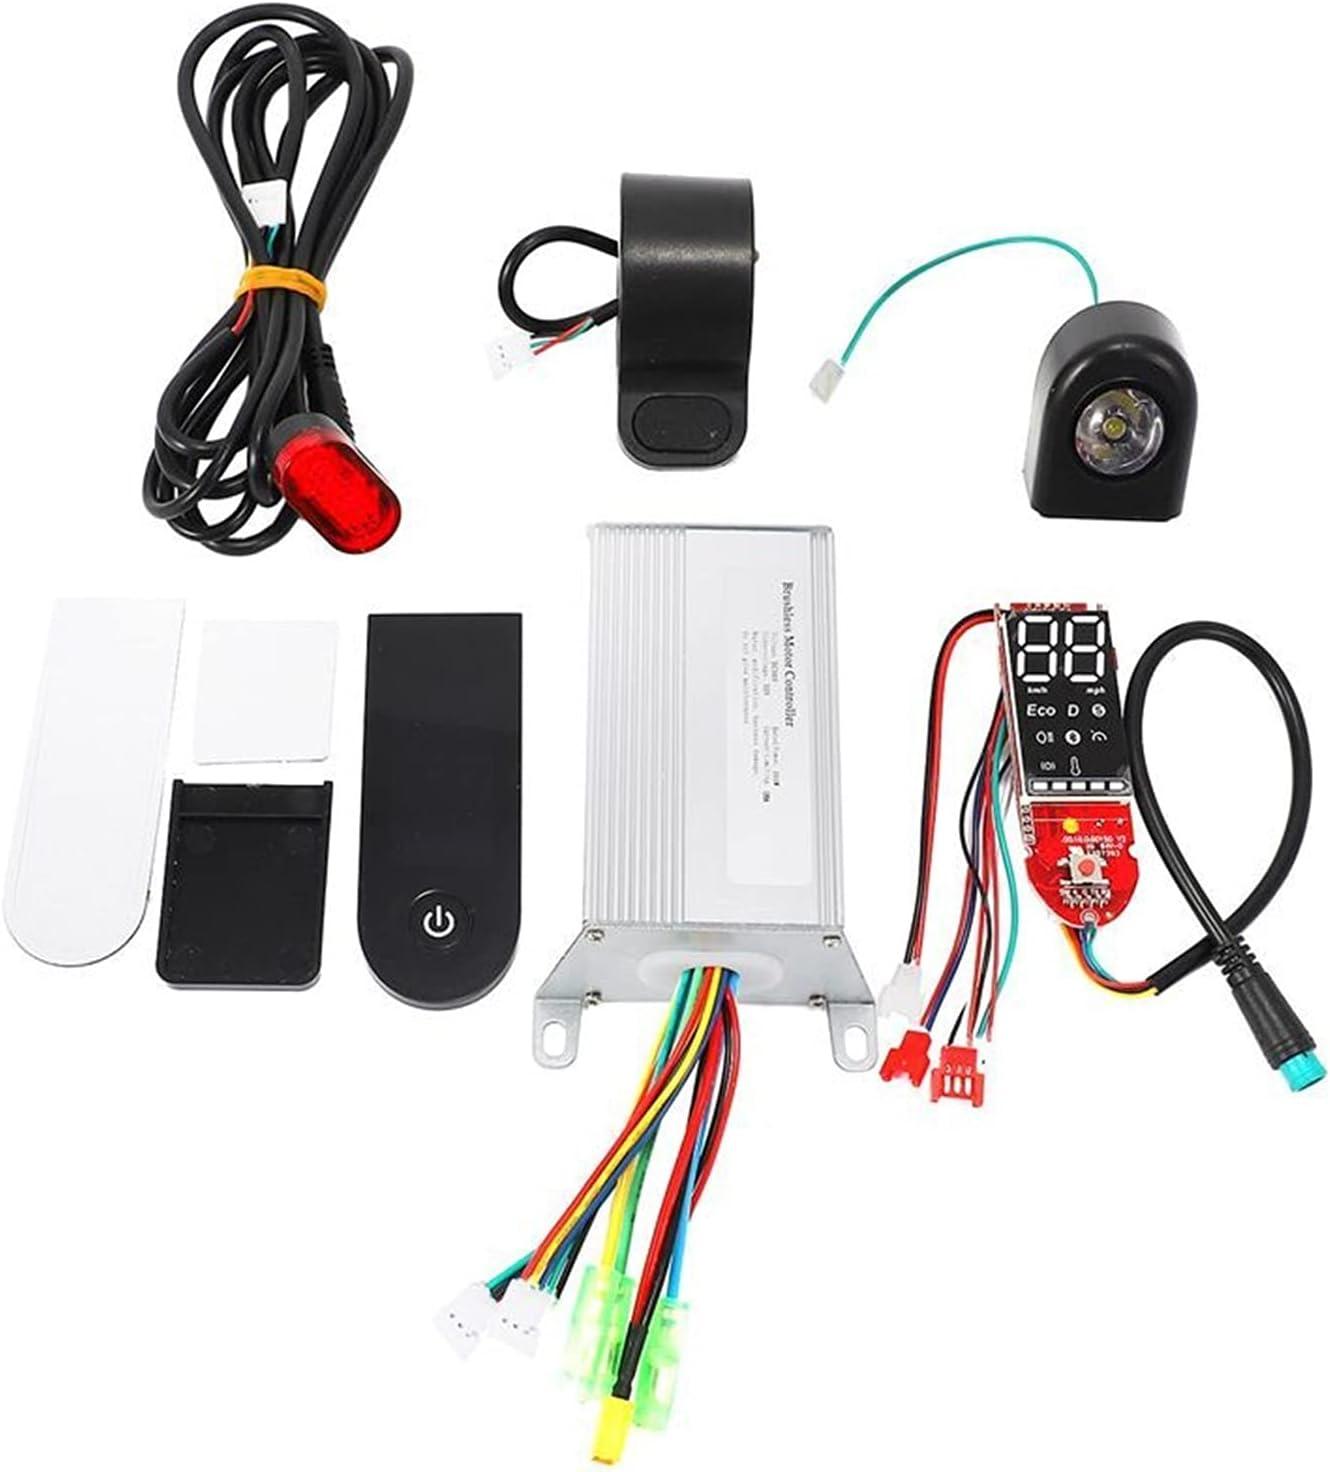 MENGHE TANGZHOU Placa Base del Tablero del Controlador del Scooter de la Novela 35 0W 36V Ajustar para Xiaomi M365 / Pro Frenos de Control y Pantallas (Color : Black)